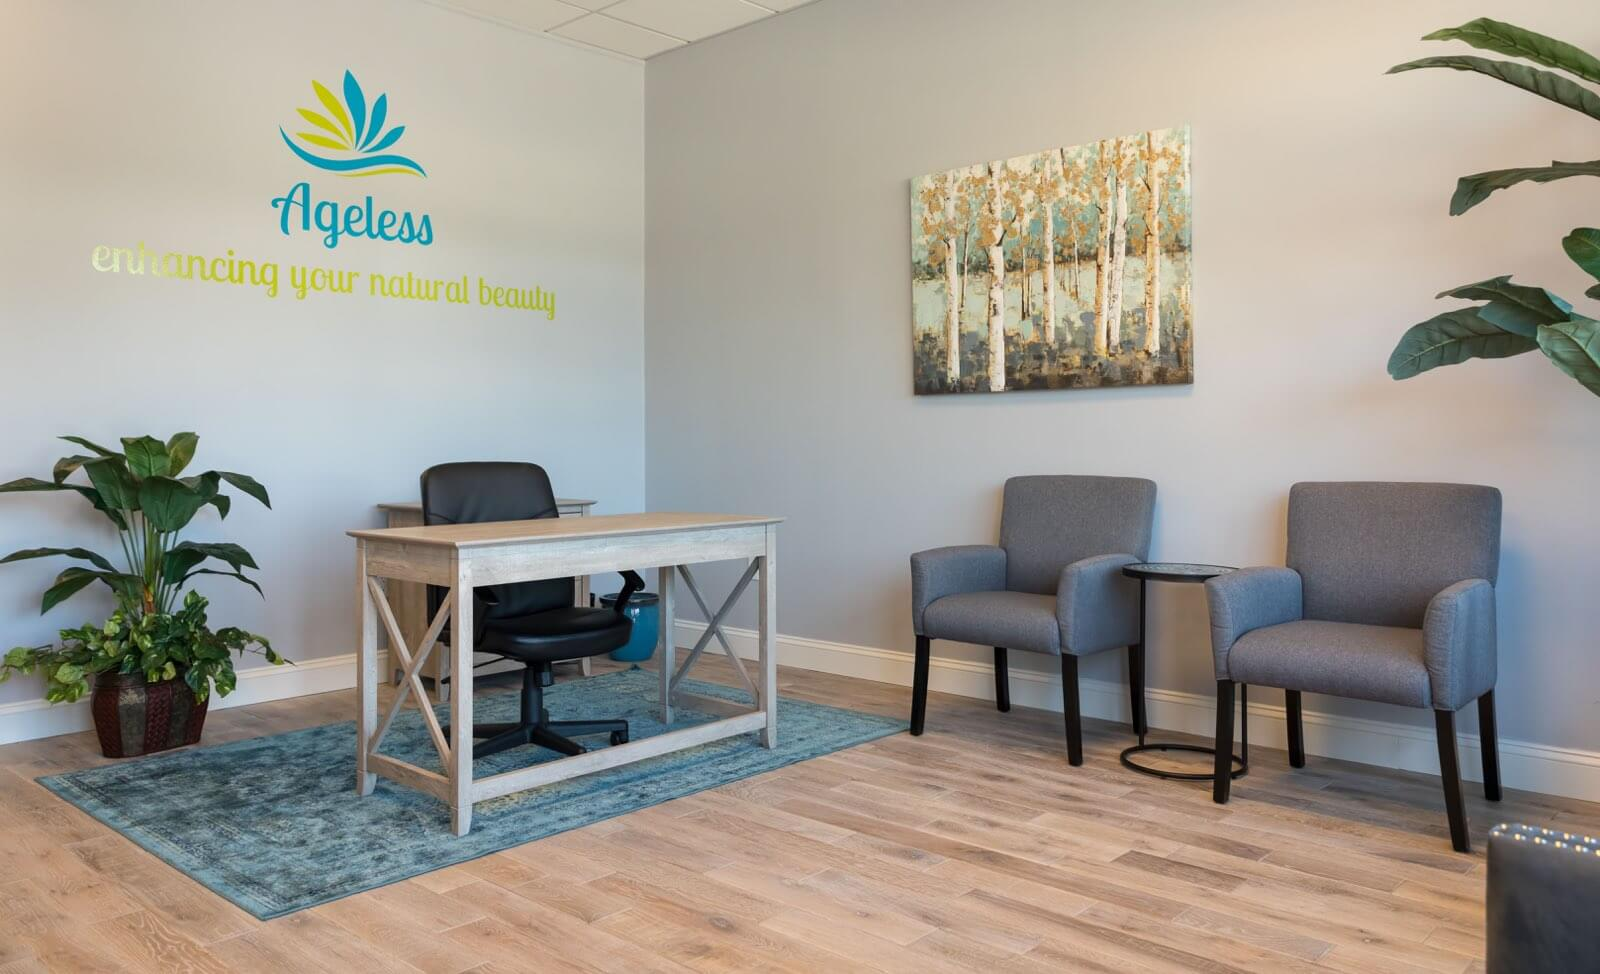 Savannah Med Spa, lobby and receptionist desk